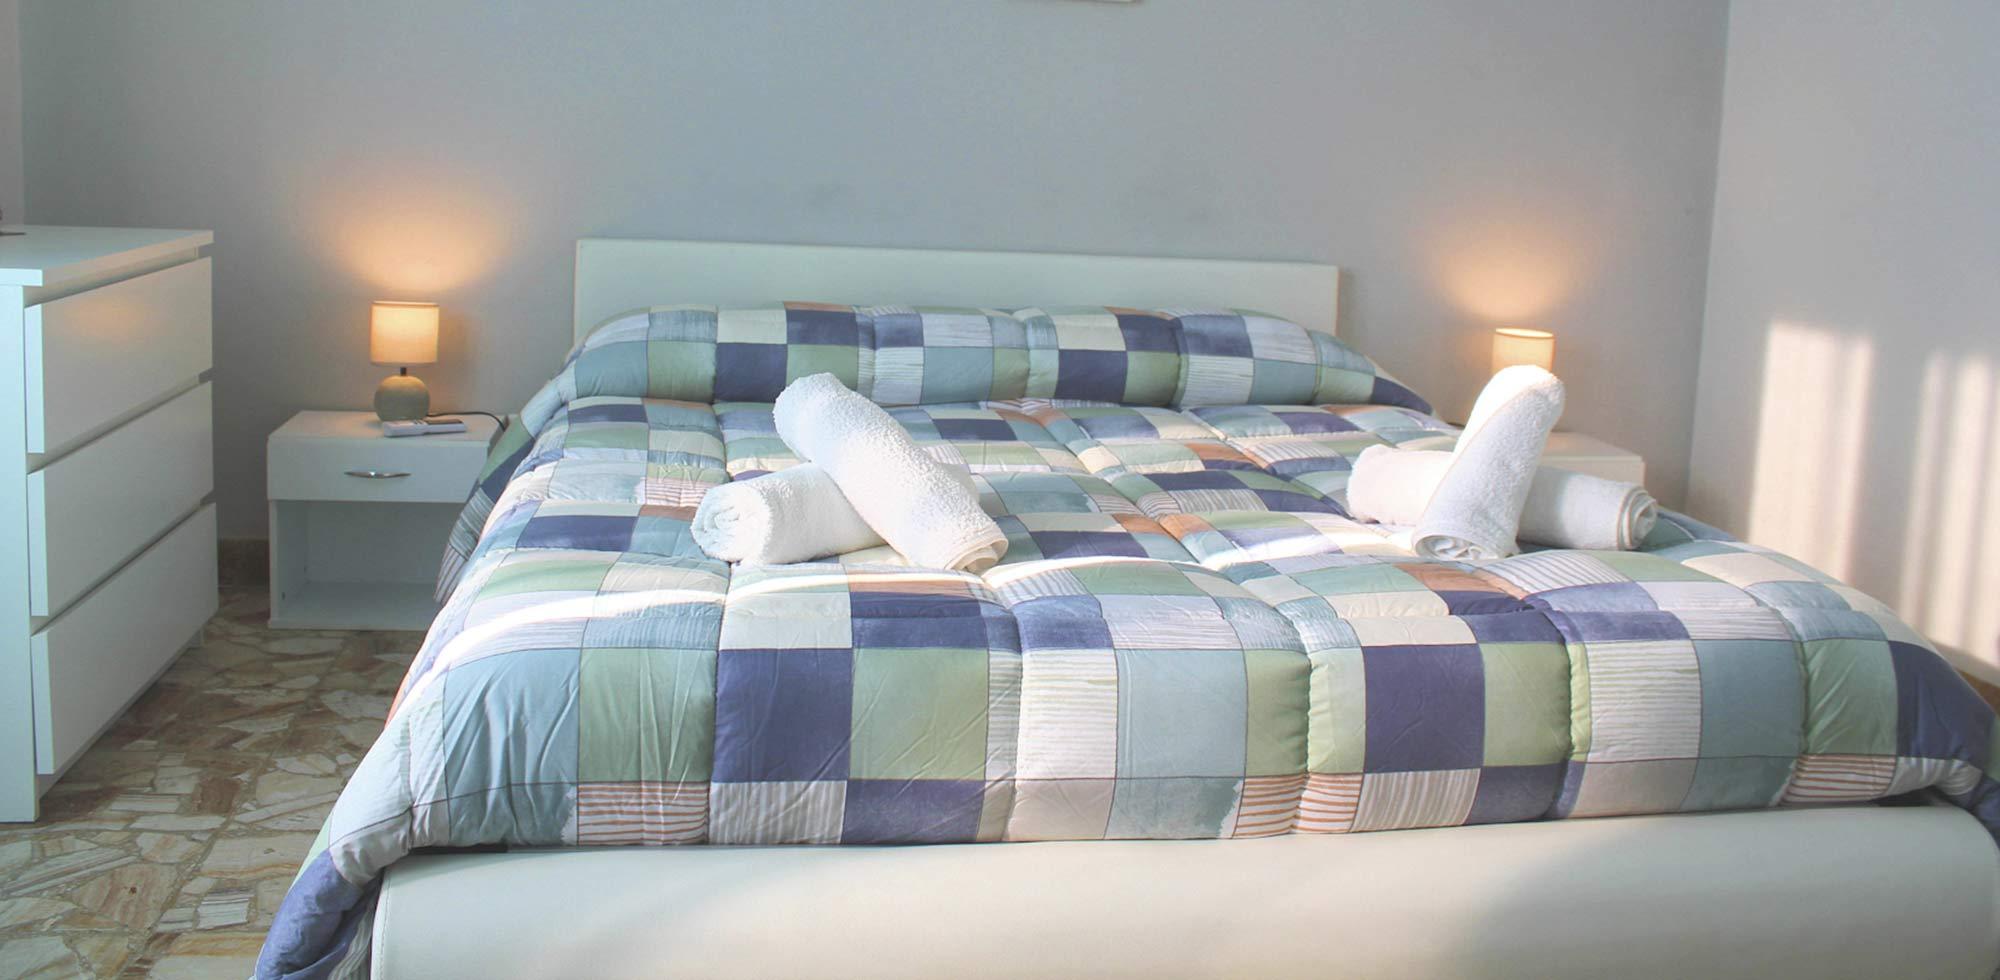 Colle dei Fiori Rooms Bed and Breakfast